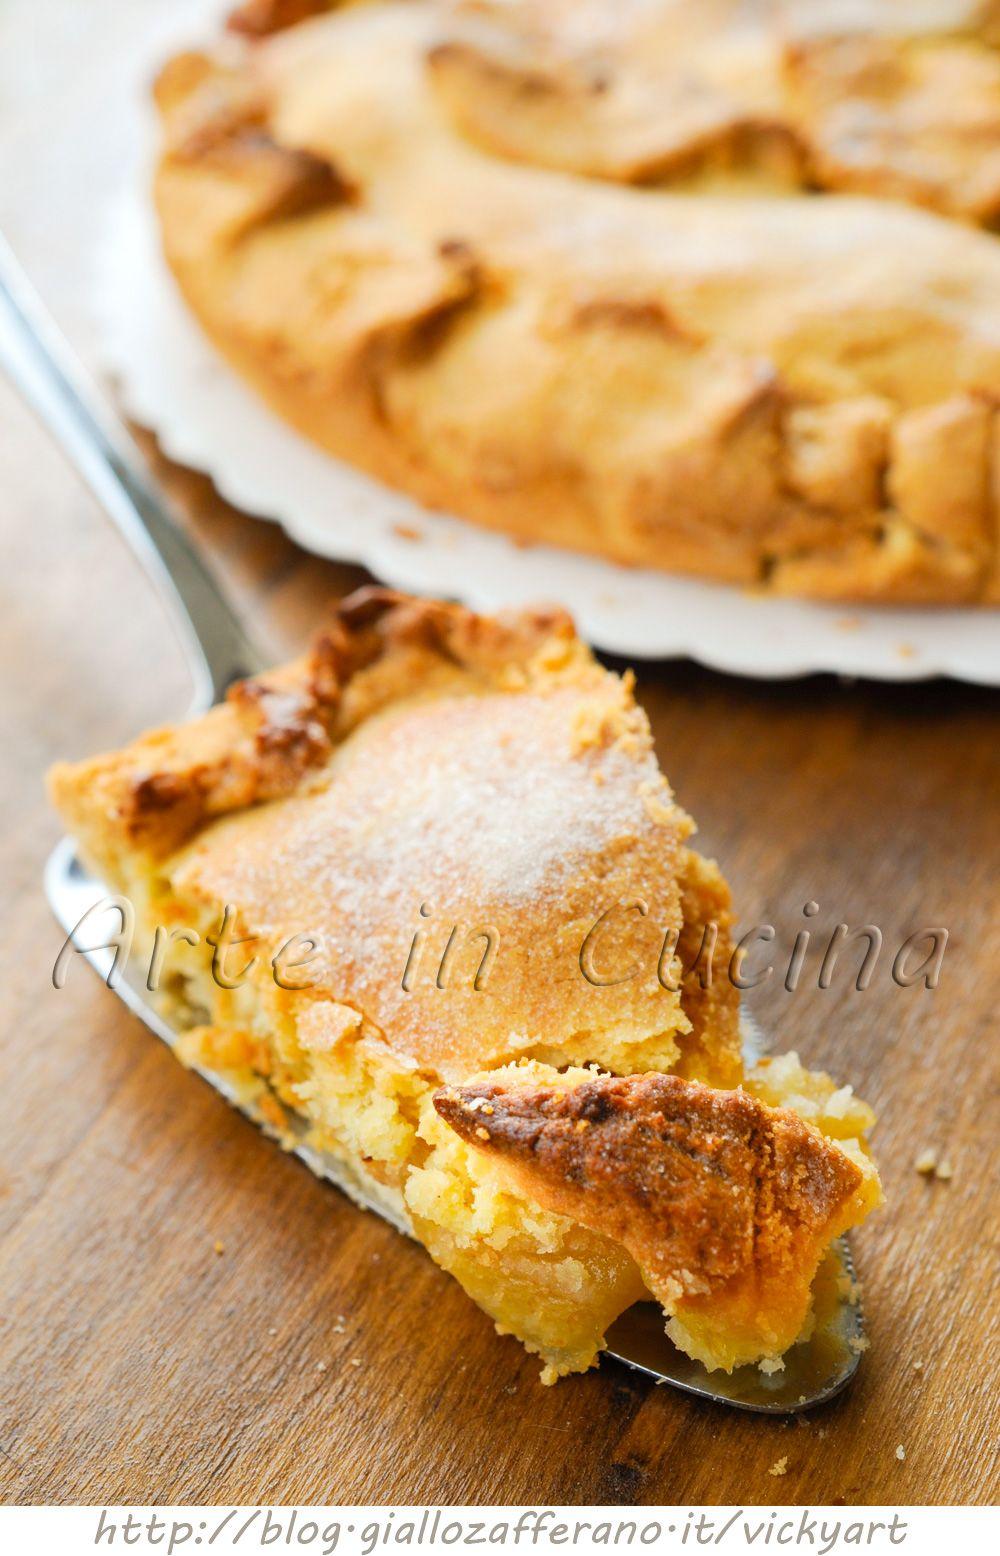 Torta di mele inglese ricetta facile | Ricette di crostata, Torte ...